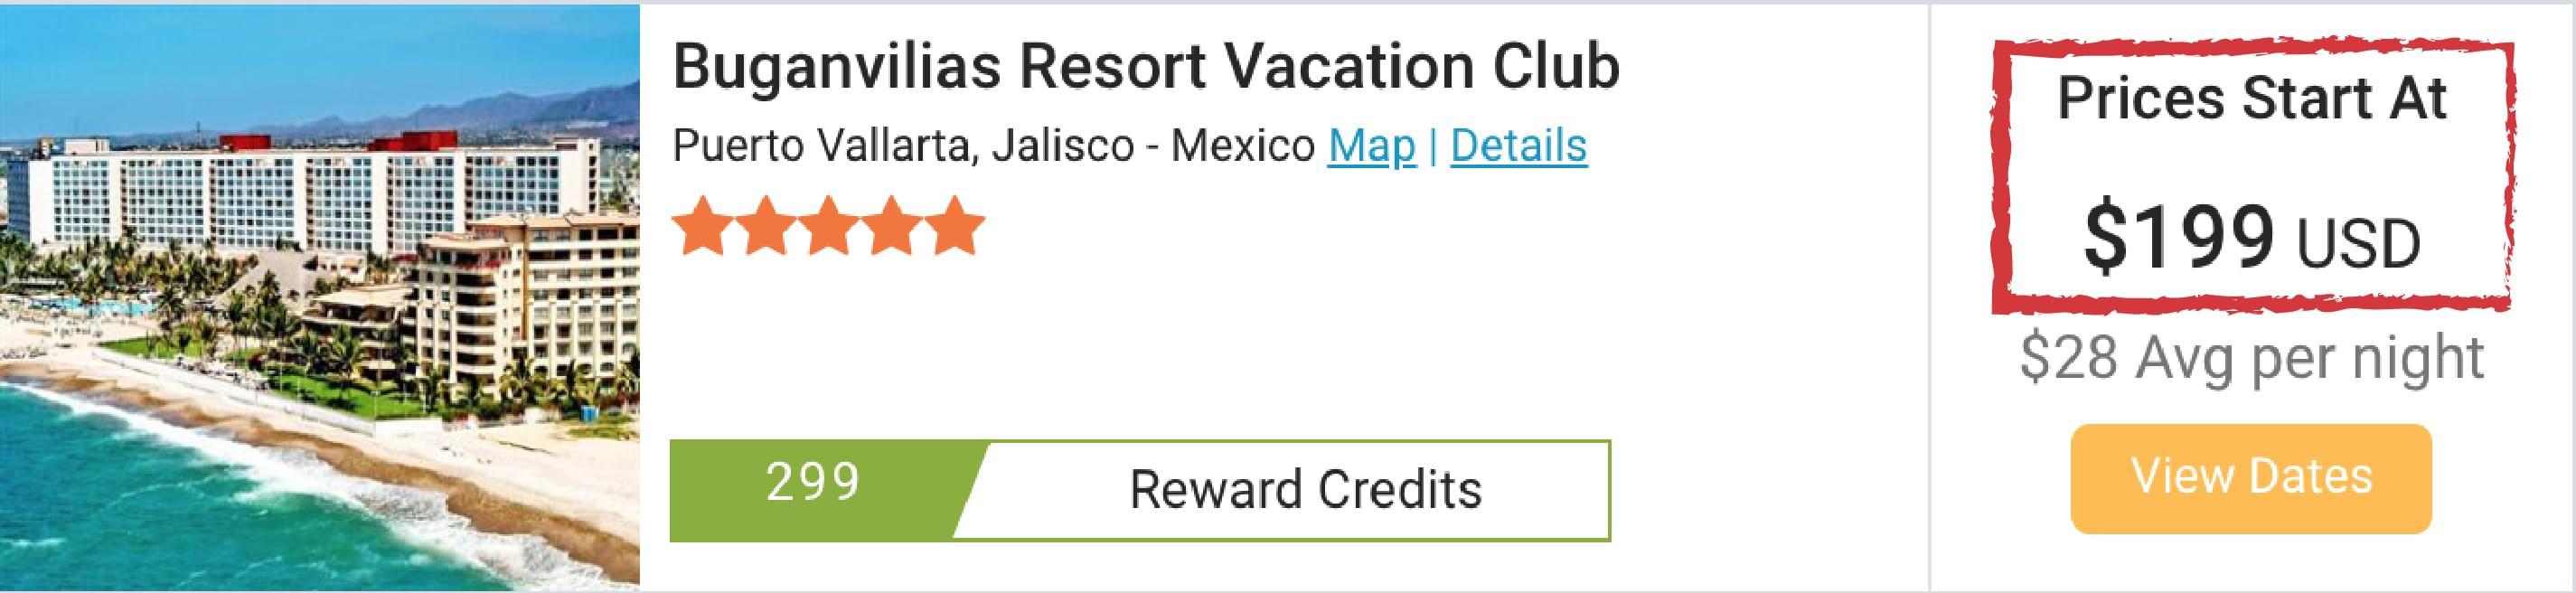 last minute hotel deal in resort vacation club in Puerto Vallarta, Mexico